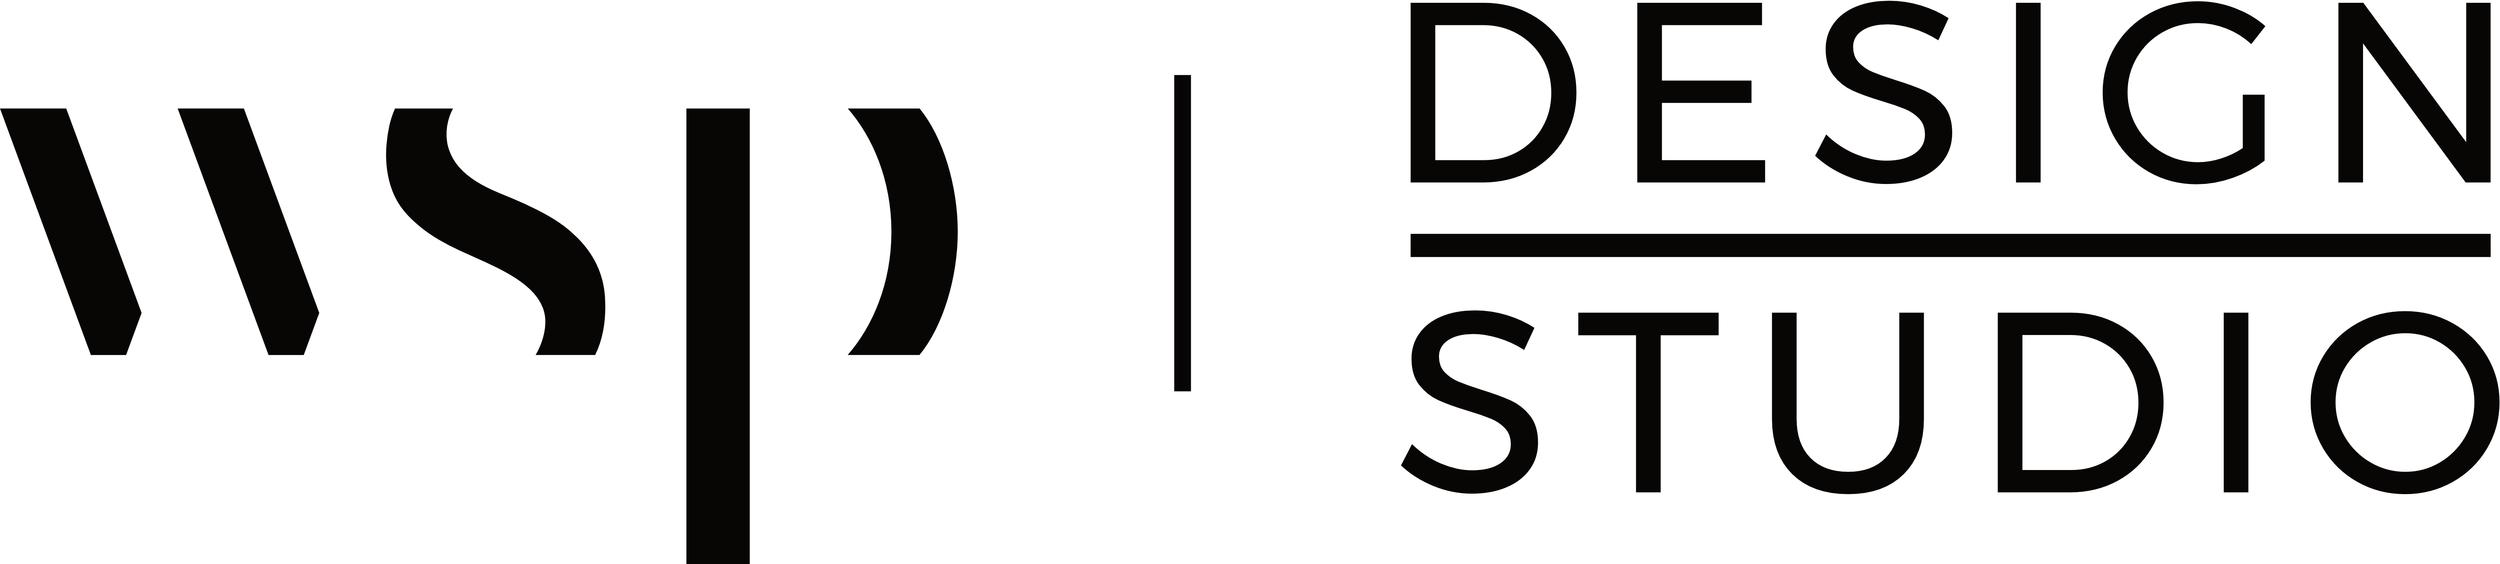 wsp_design_studo.png